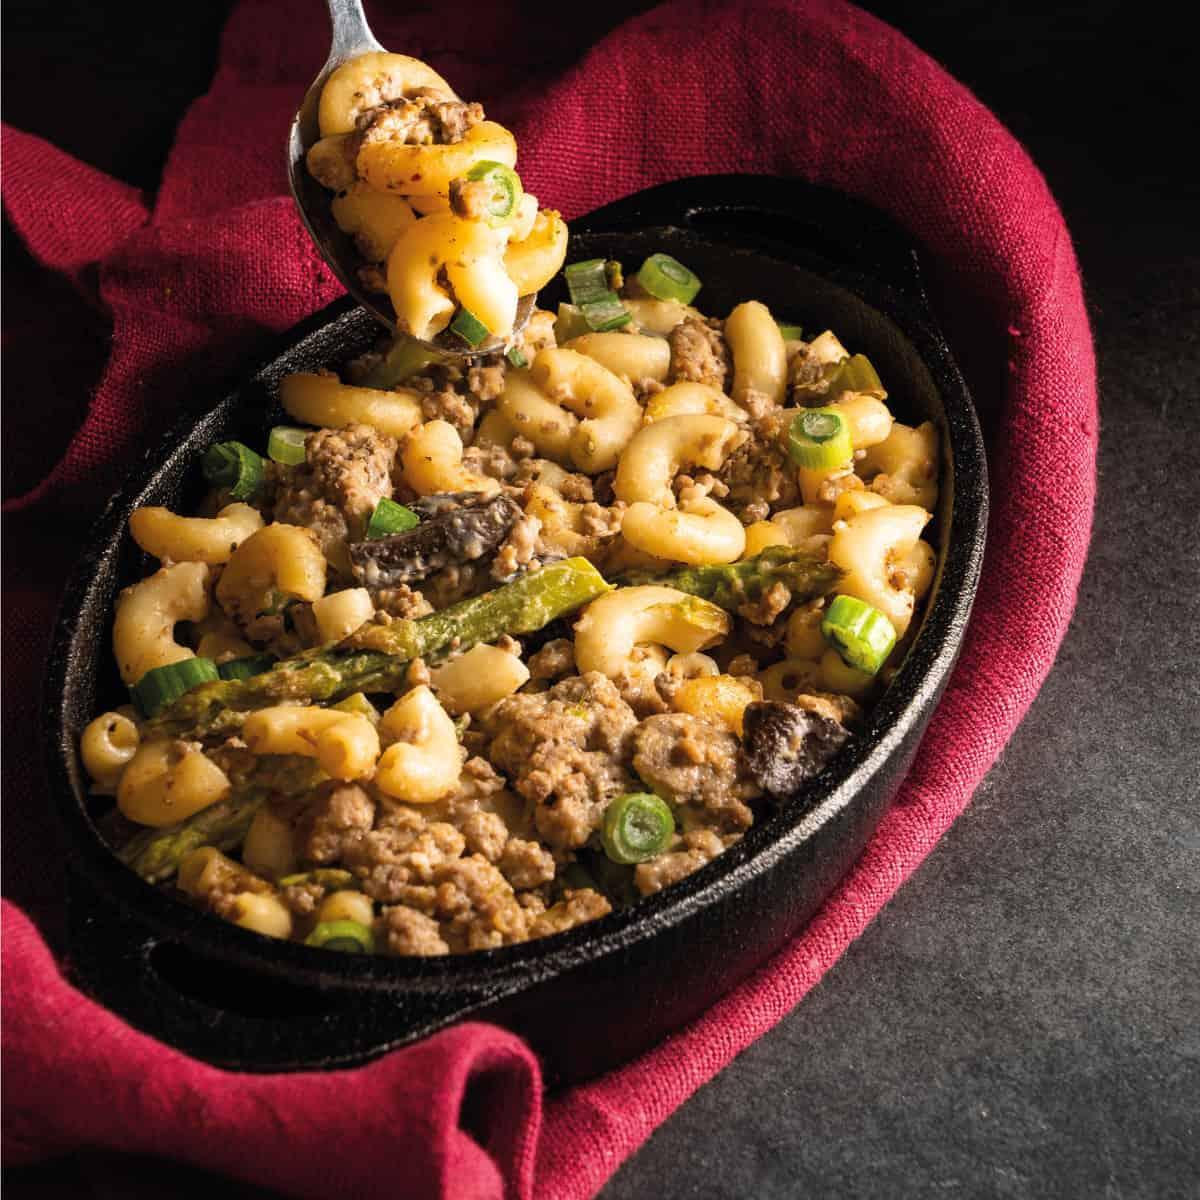 macaroni and cheese enhanced with hamburger, asparagus, and mushrooms